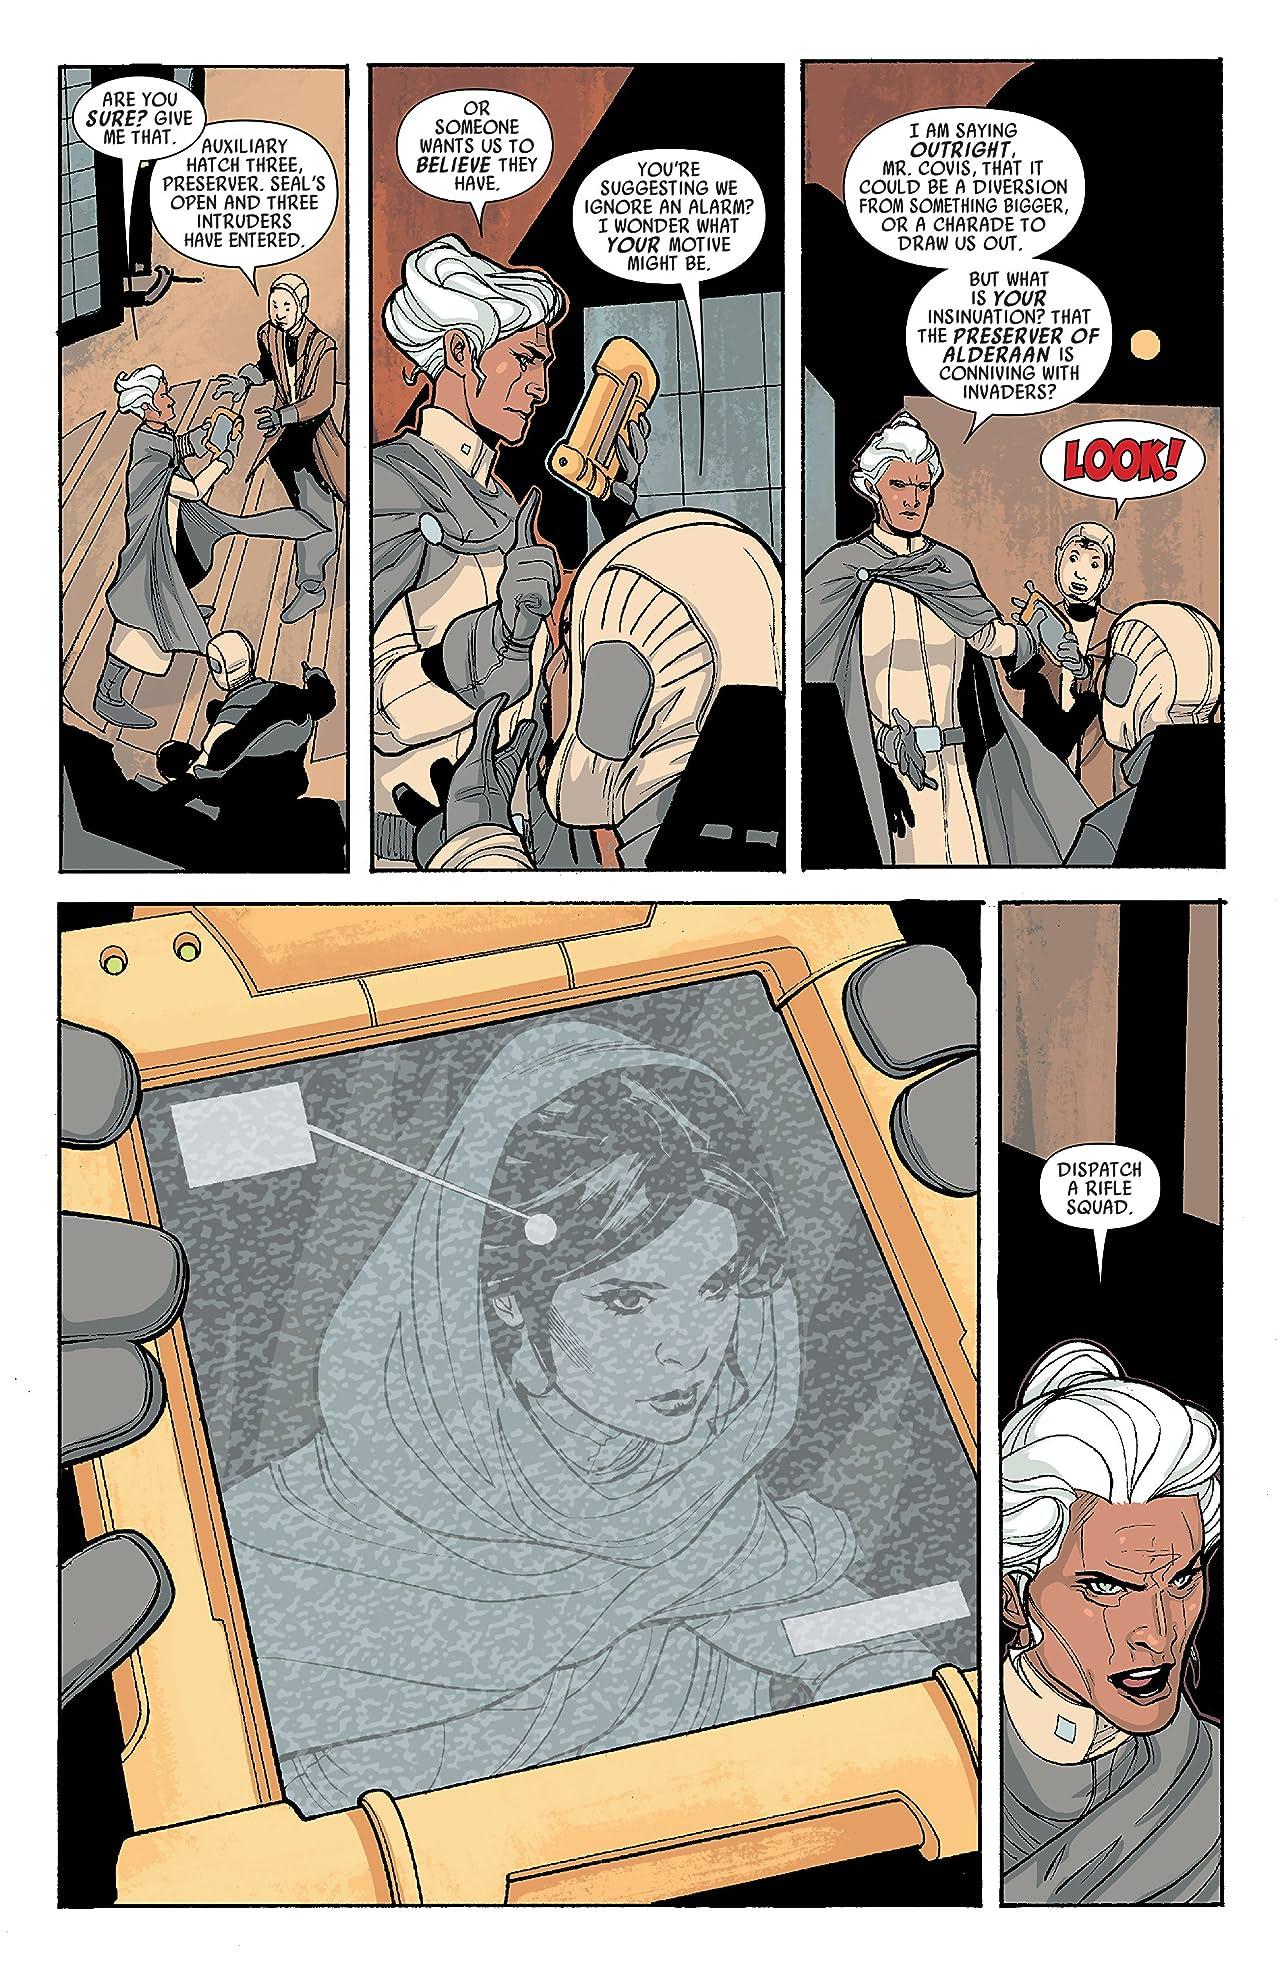 Princess Leia (2015) #3 (of 5)